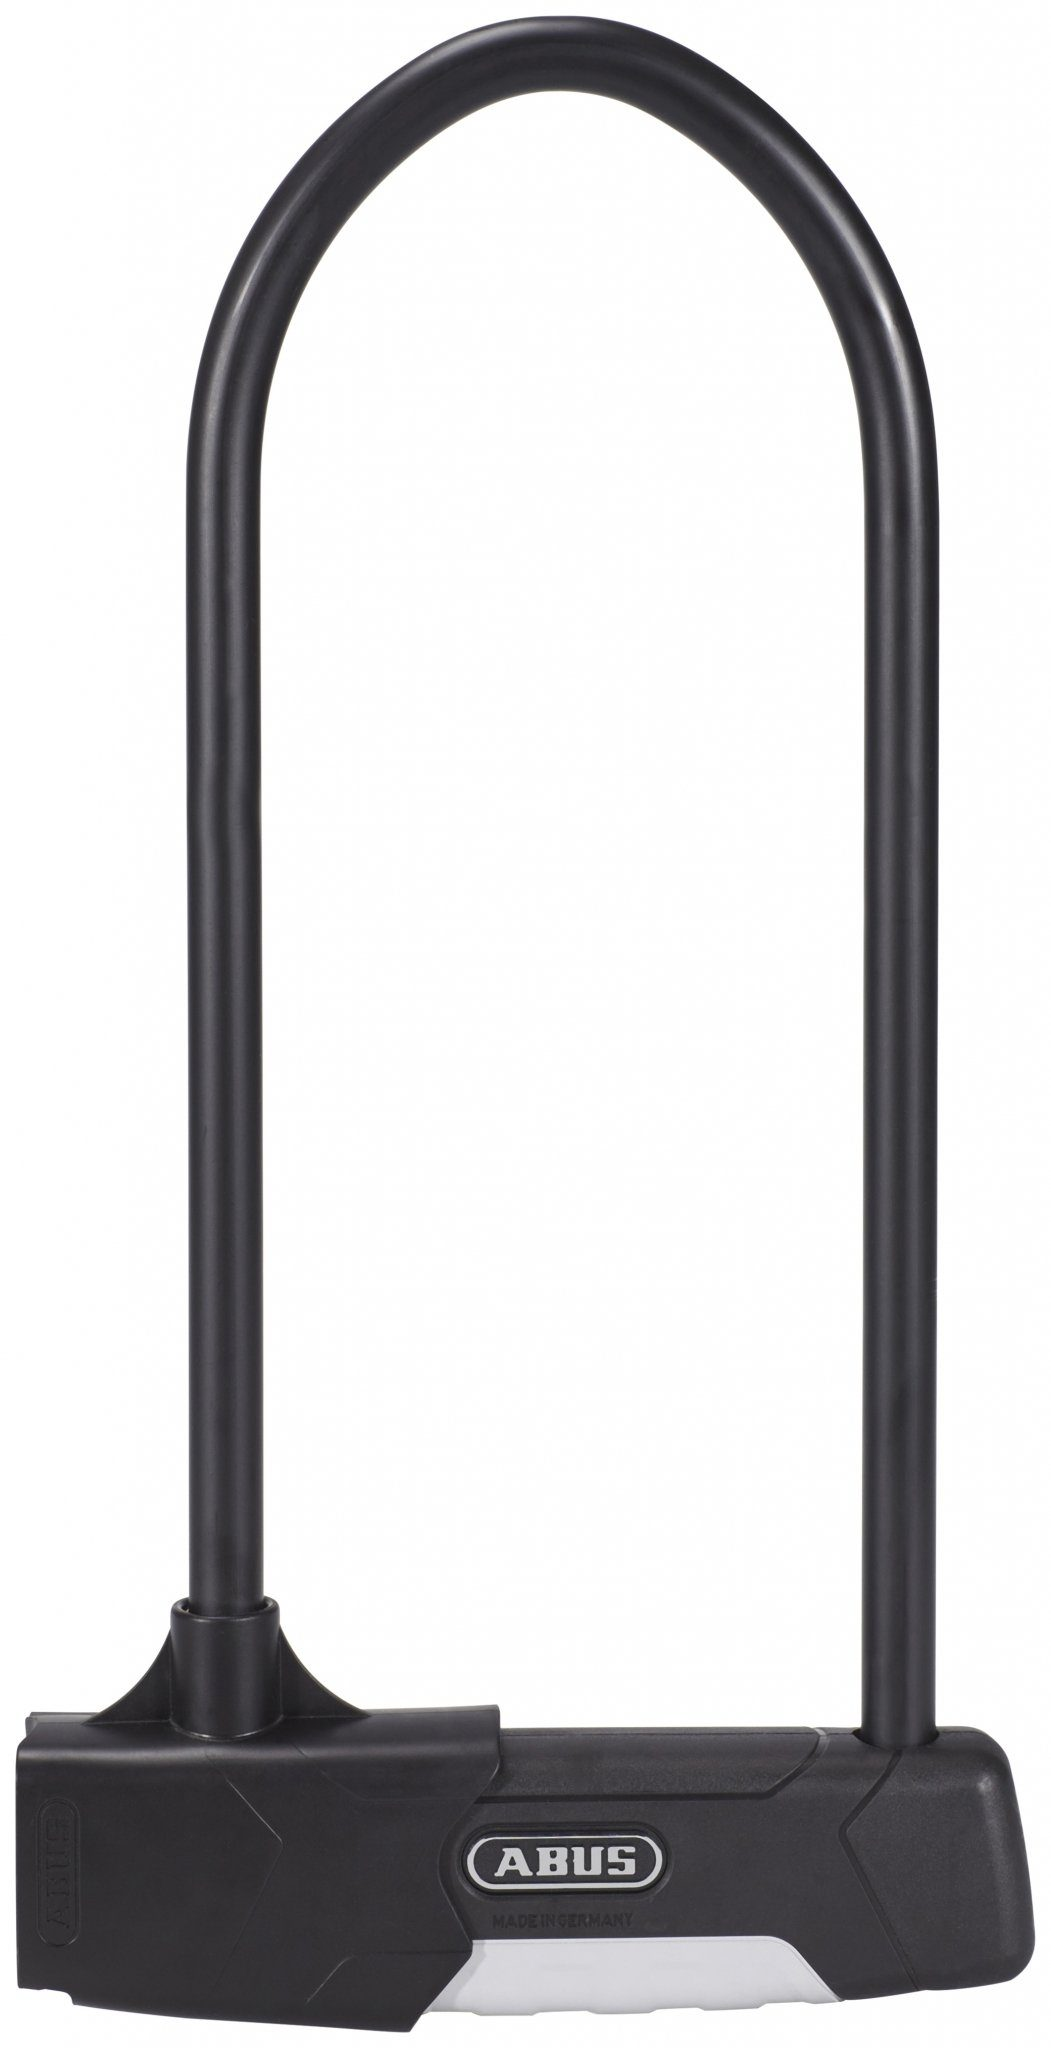 ABUS Fahrradschloss »ABUS Granit Plus 470 Bügelschloss 300mm USH 470«